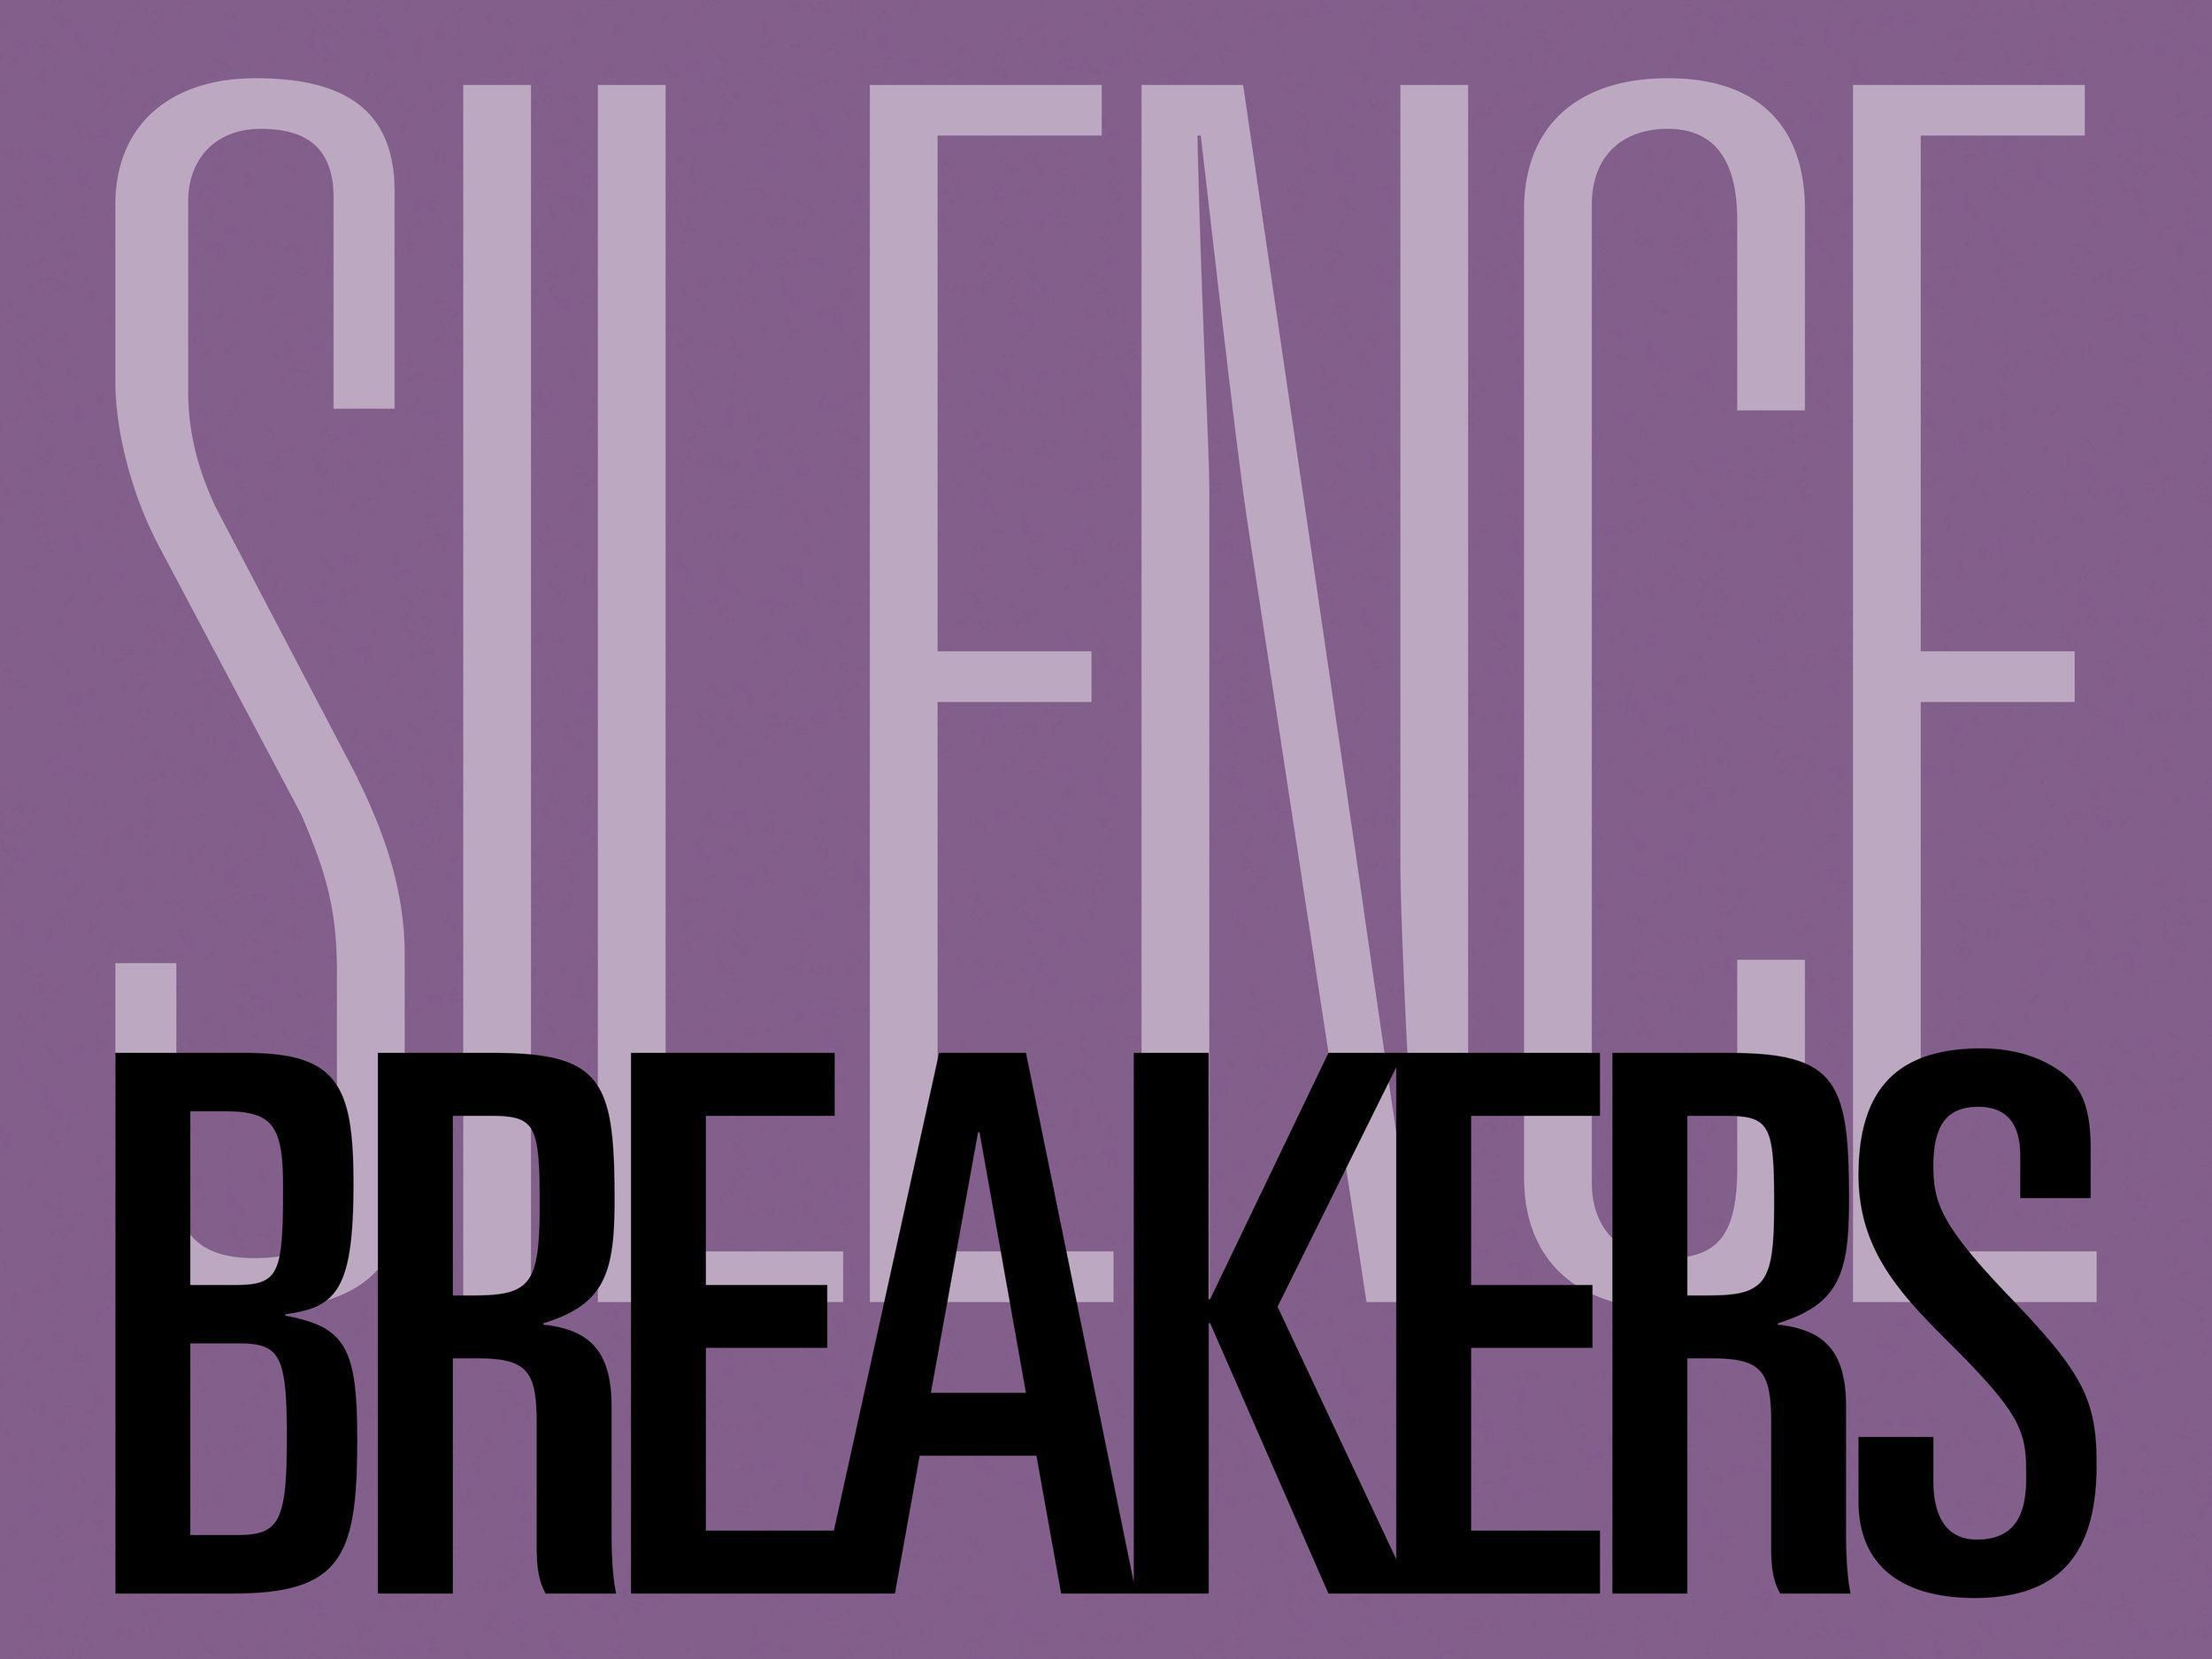 ecoca_silencebreakers_banners3.jpg